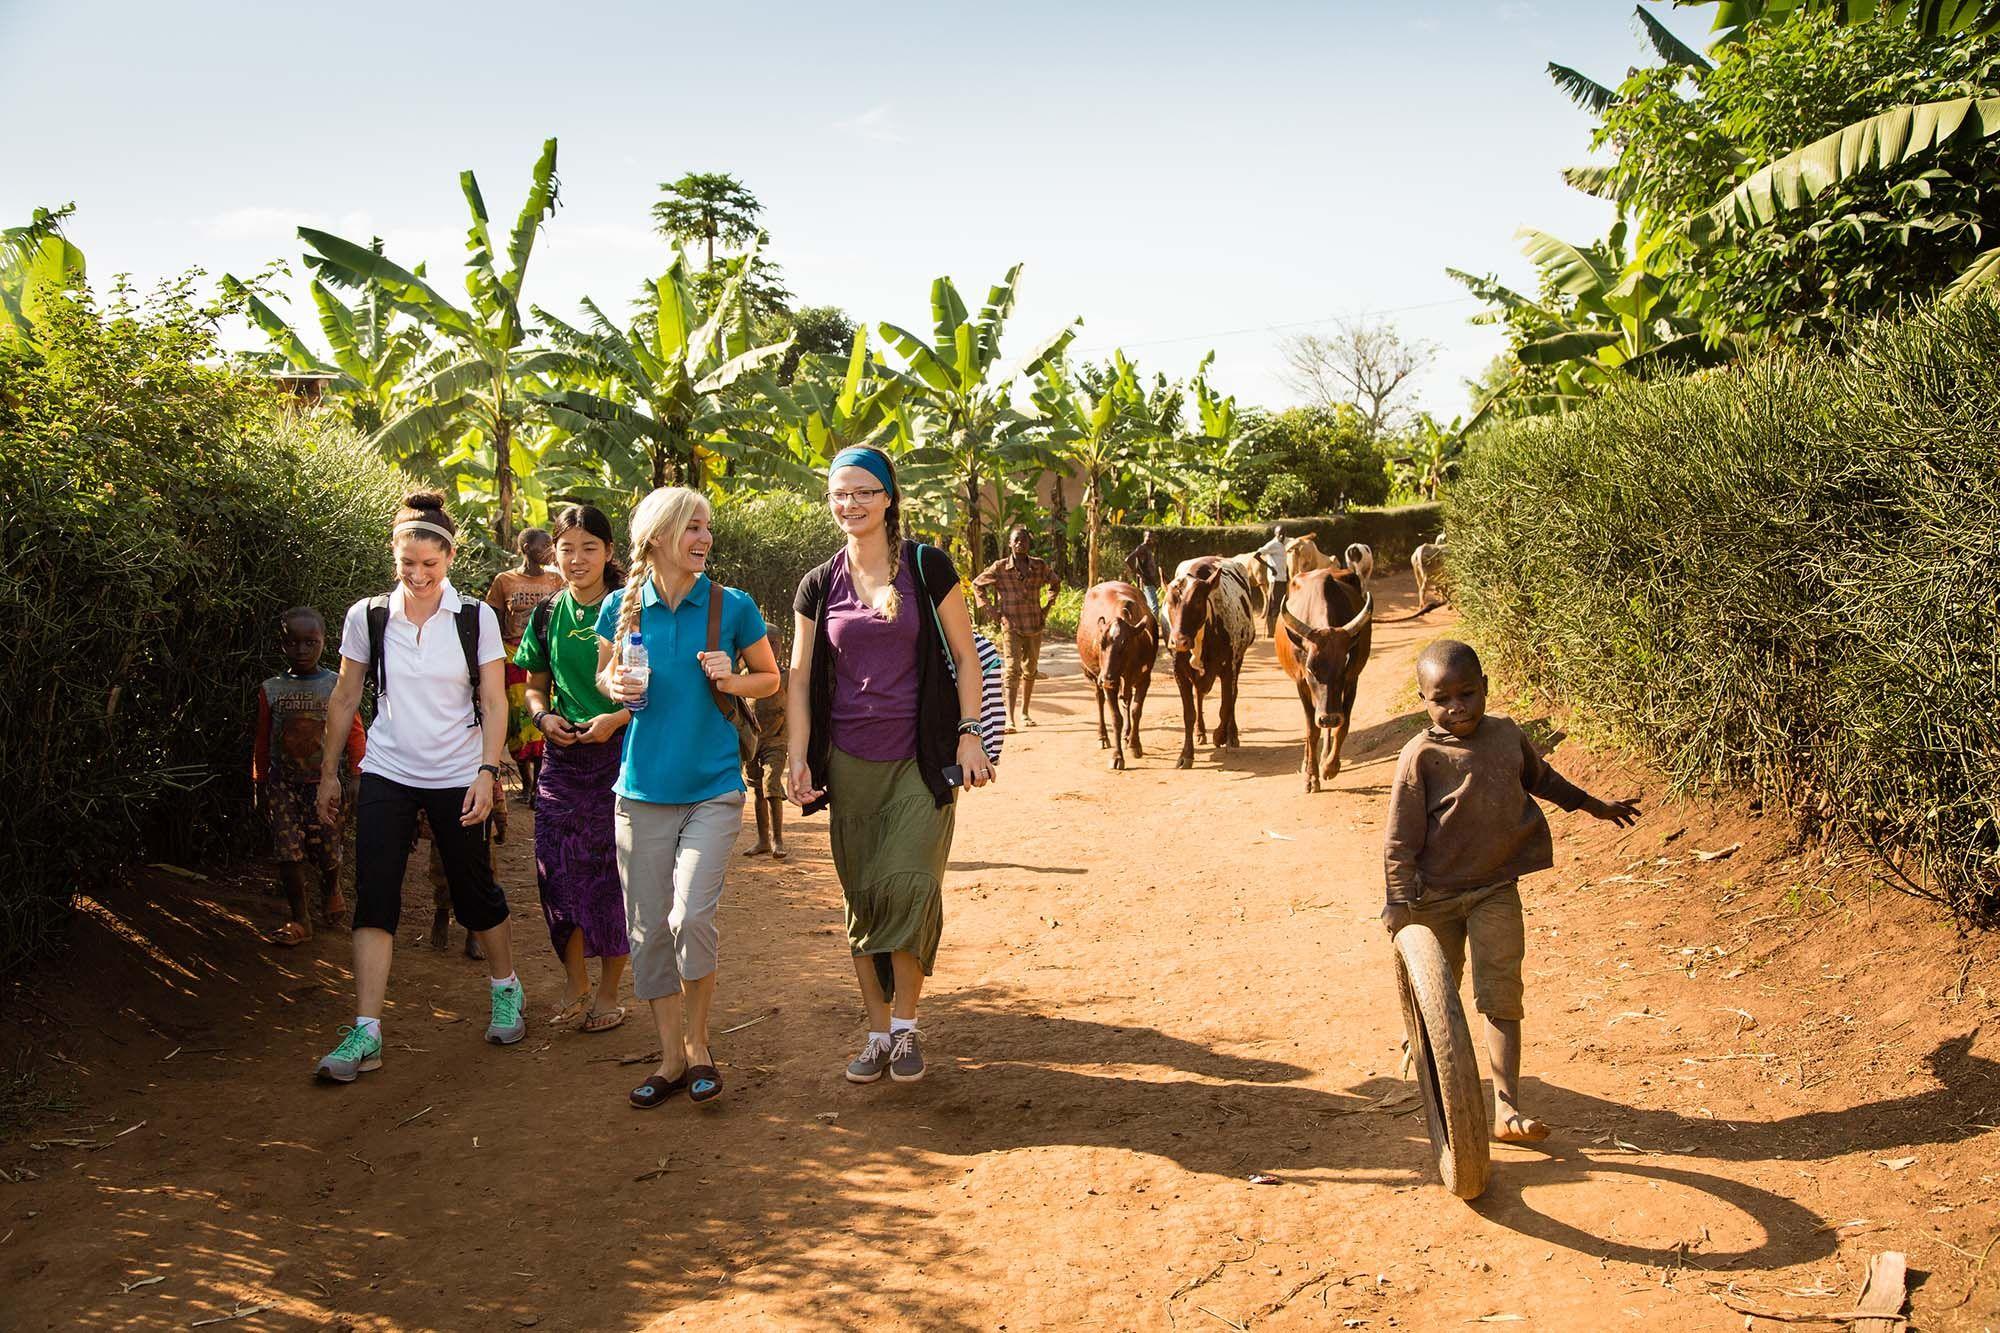 Students hike through a village in Rwanda on a field study.